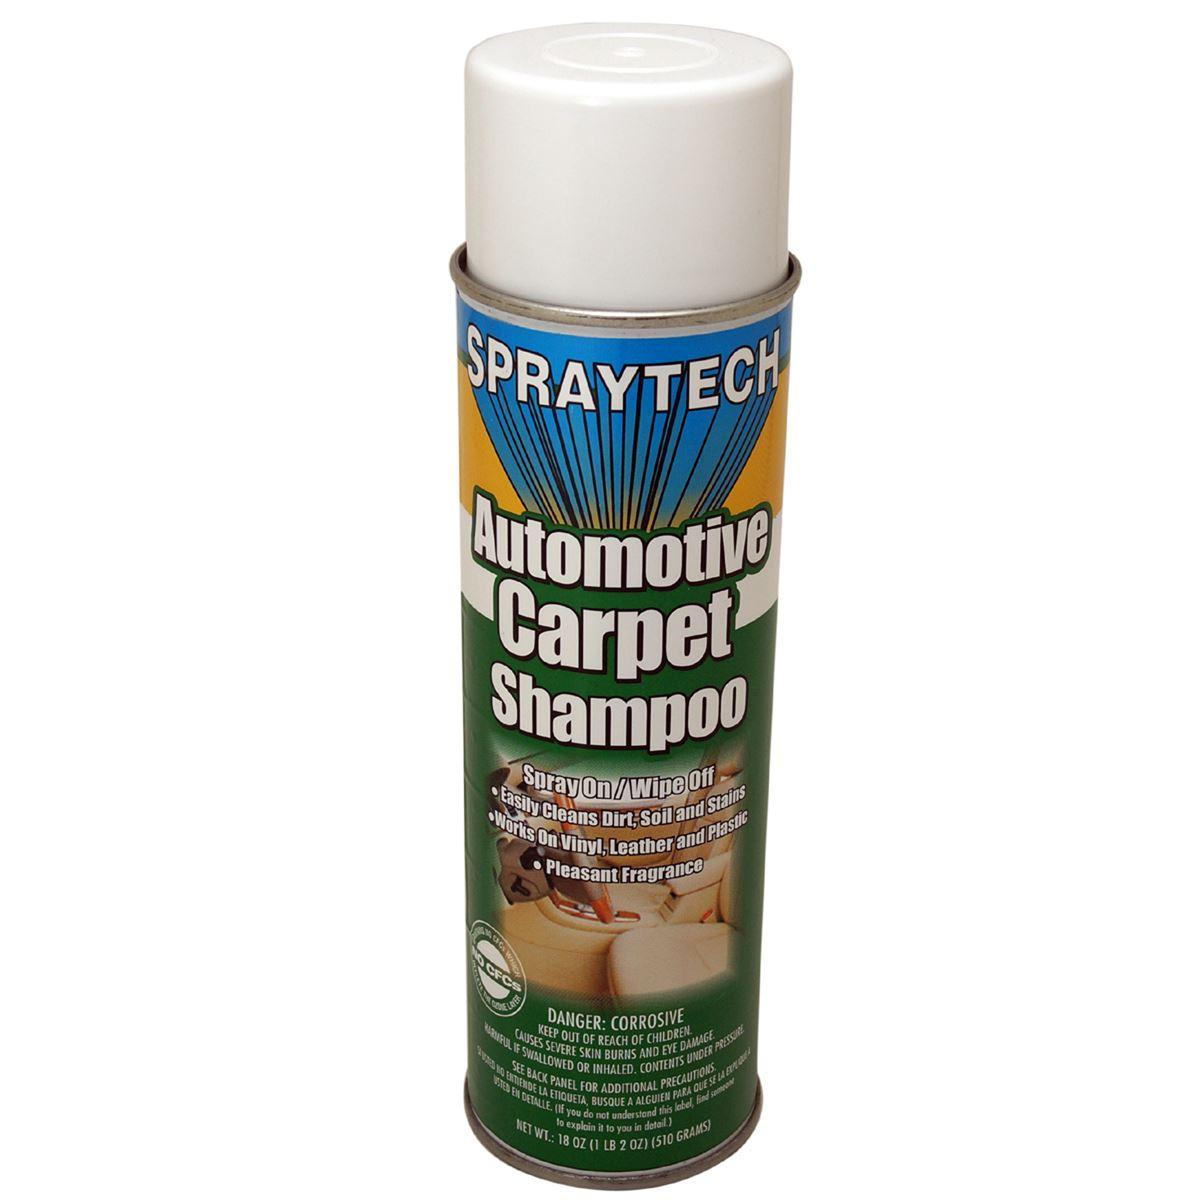 Car Carpet Shampoo Products: AUTOMOTIVE CARPET SHAMPOO. Professional Detailing Products